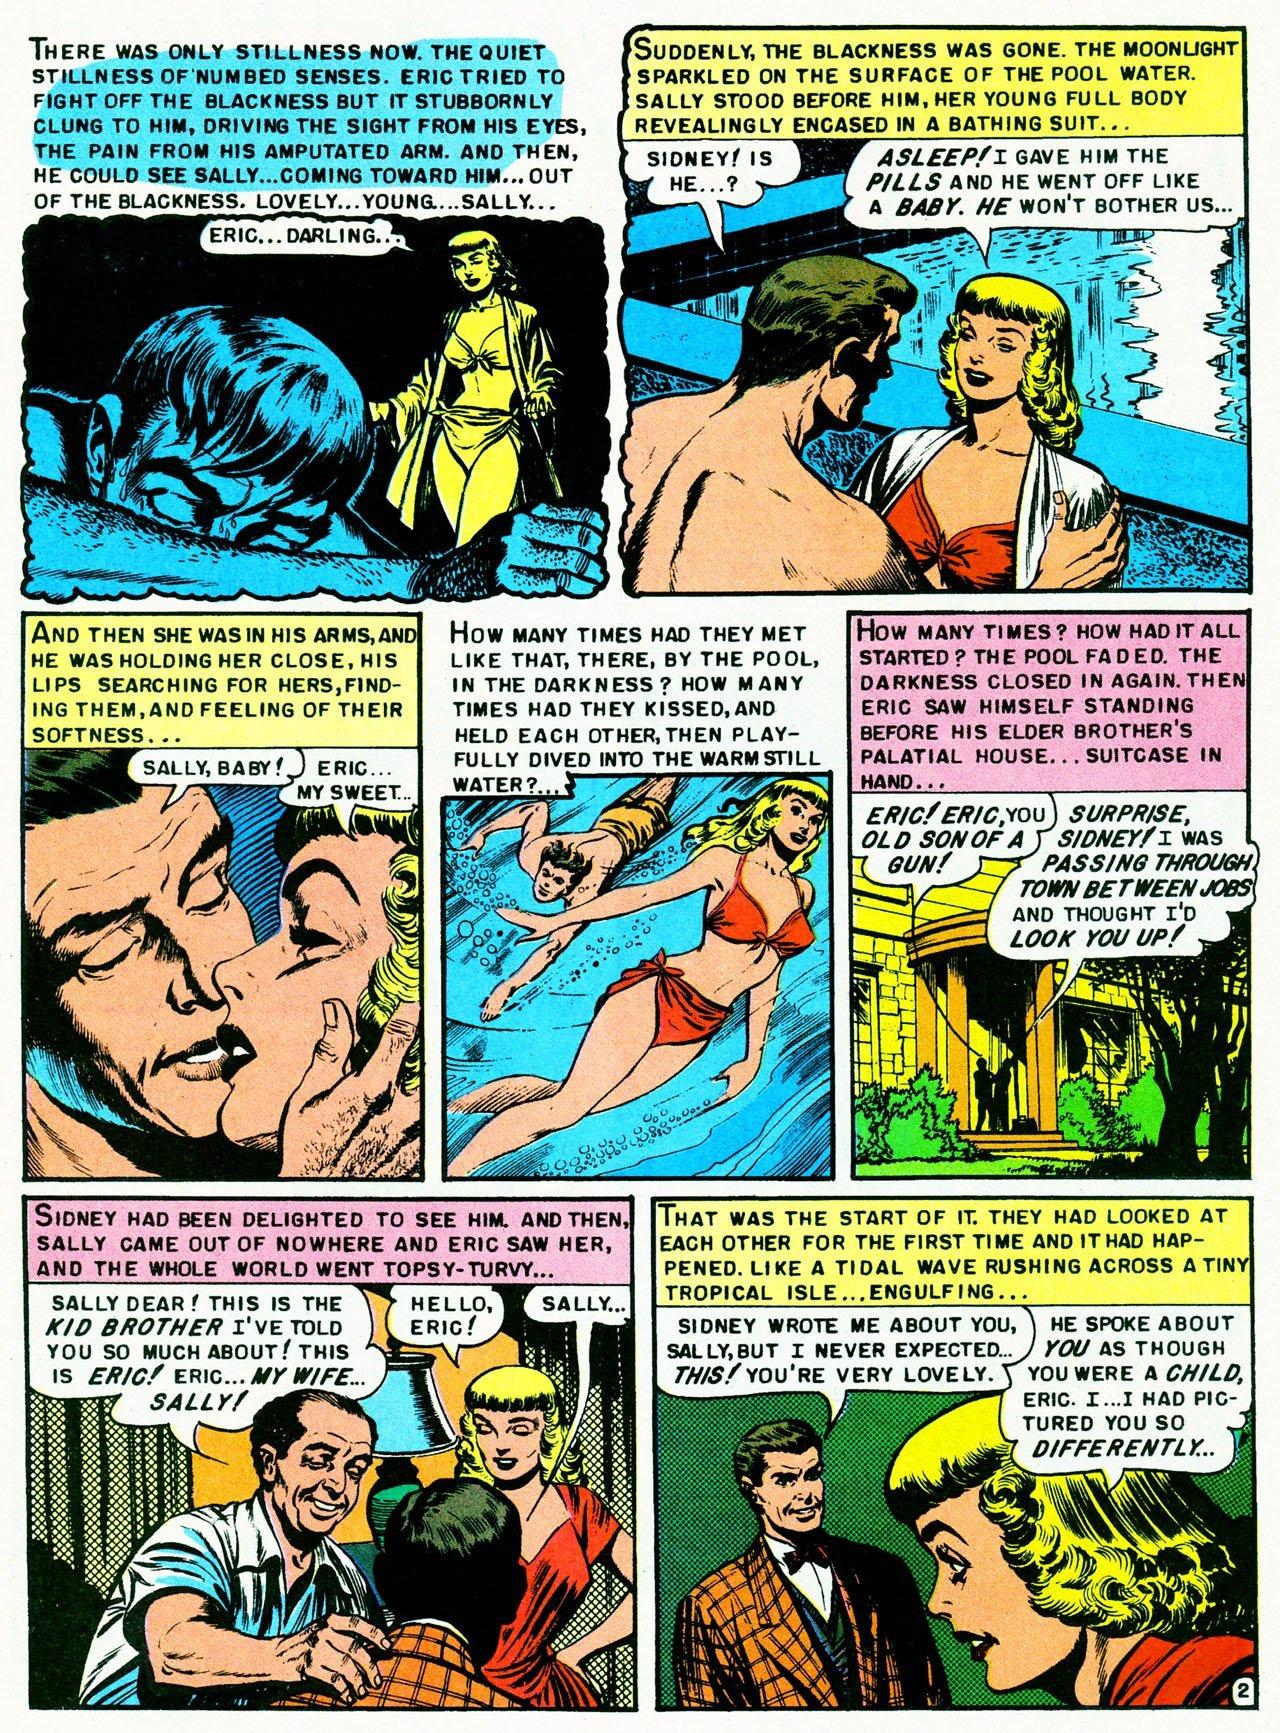 Read online Shock SuspenStories comic -  Issue #8 - 4